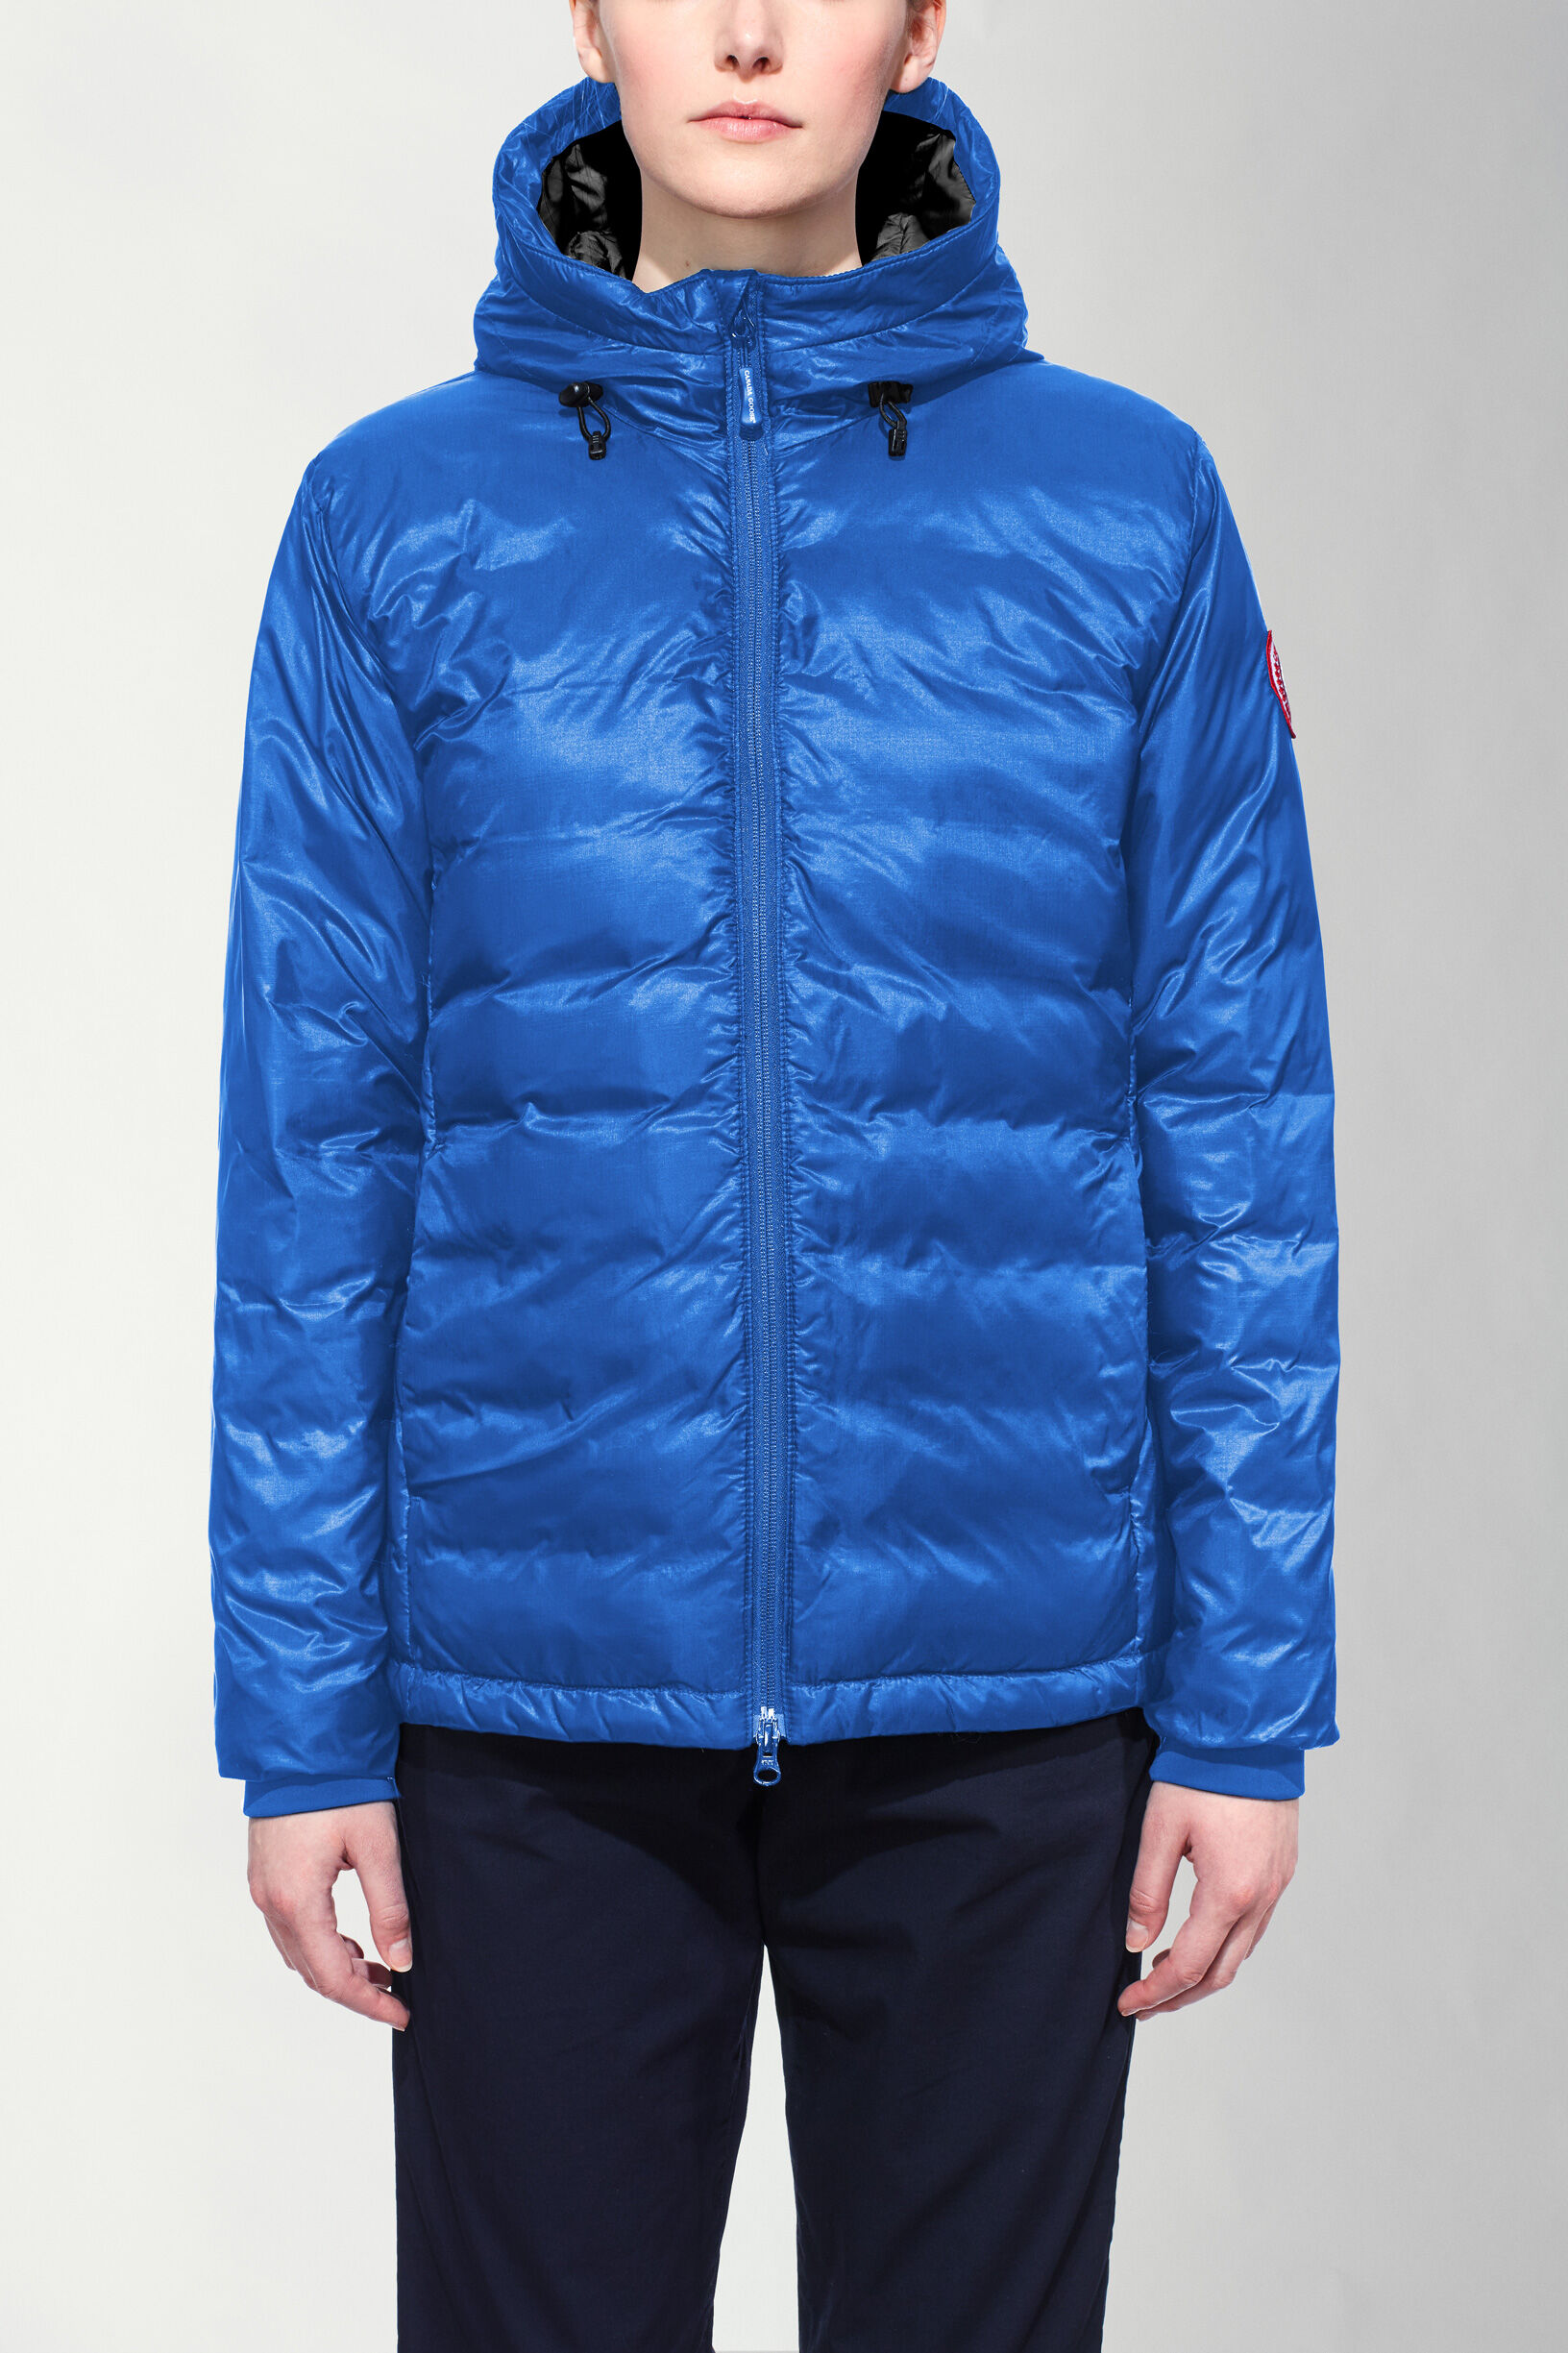 canada goose jacket blue